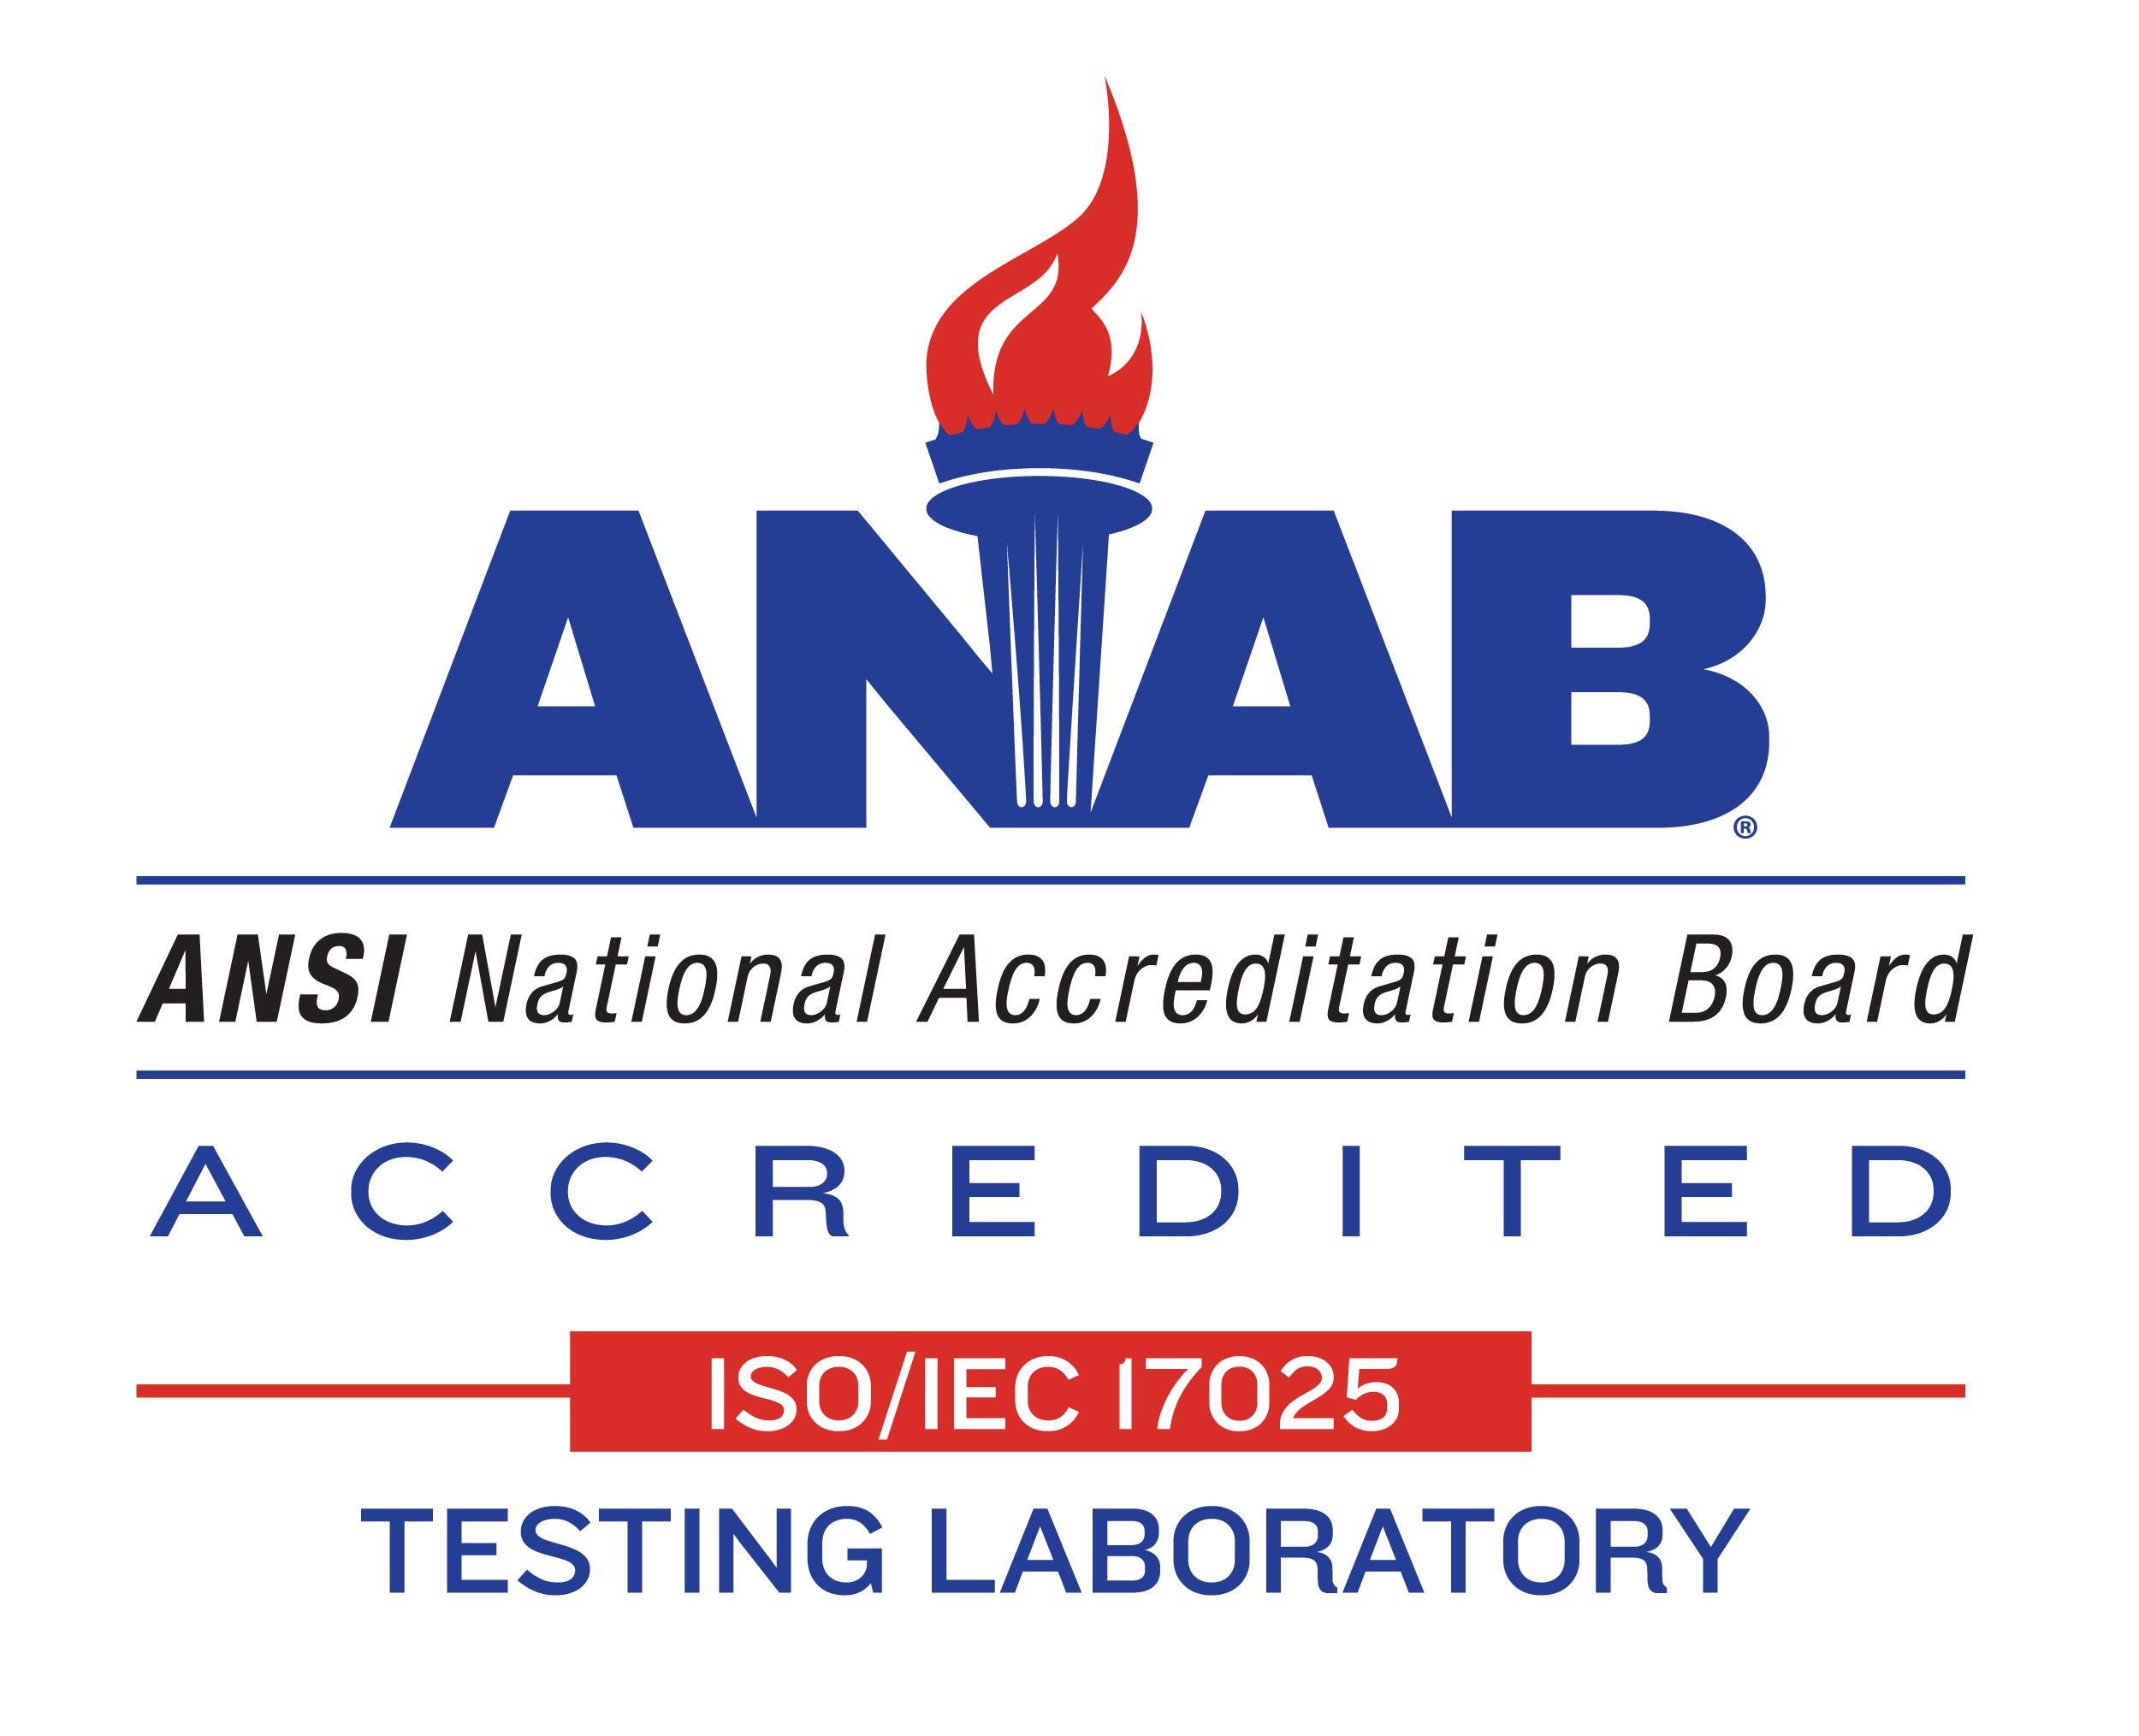 ANSI National Accreditation Board Accredited Testing lab